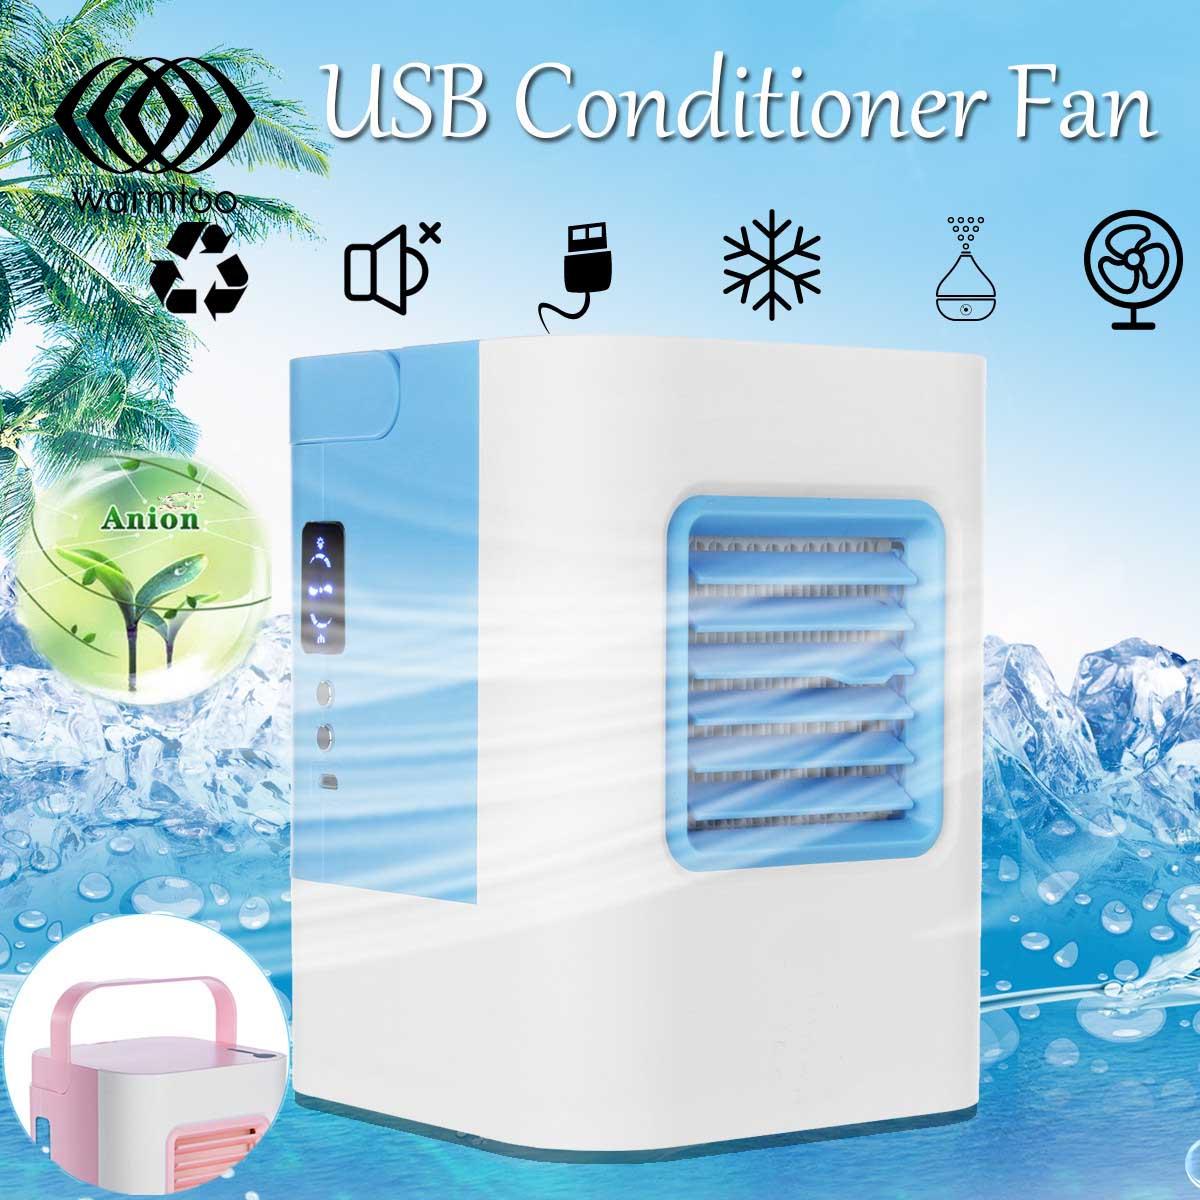 Mini Air Conditioner Cooling Fan Mobile Portable Refrigeration Conditioner Fan Cooler Home Desktop Fan Personal USB Humidifier portable usb no leaf fan mini bladeless refrigeration desktop air conditioner y05 c05